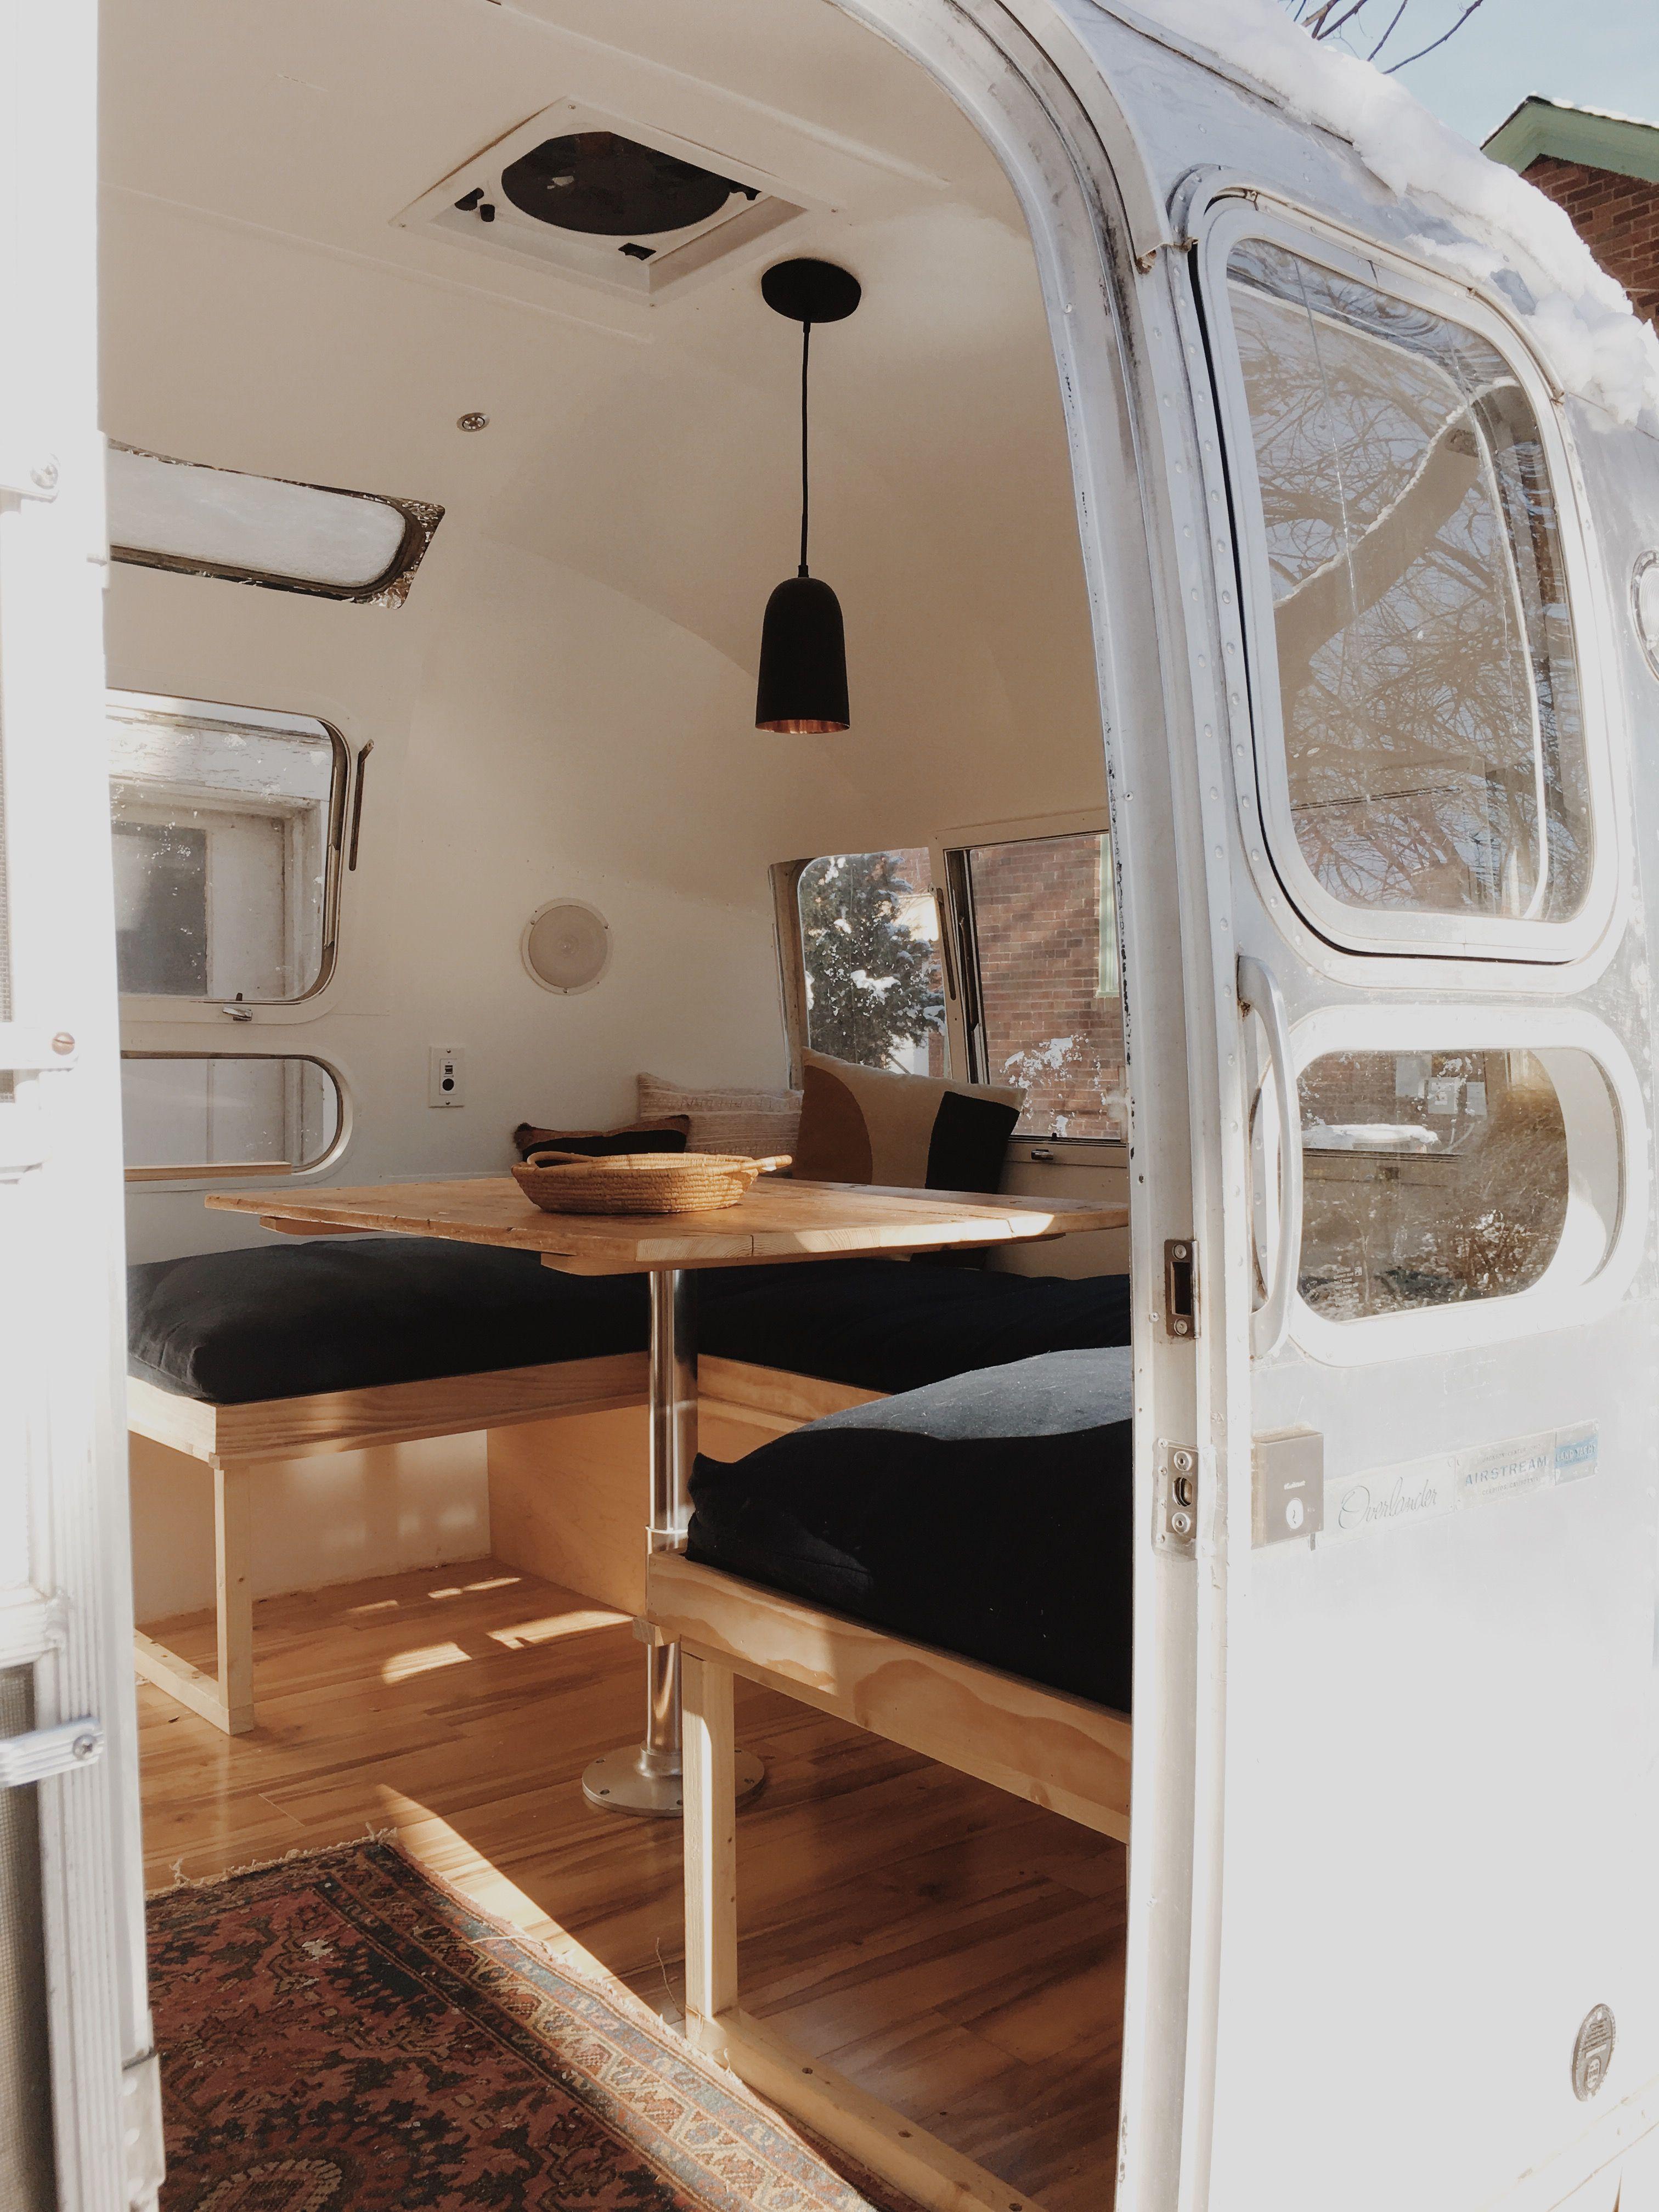 Pin de ach gate en caravana airstream interior camper - Interior caravana ...